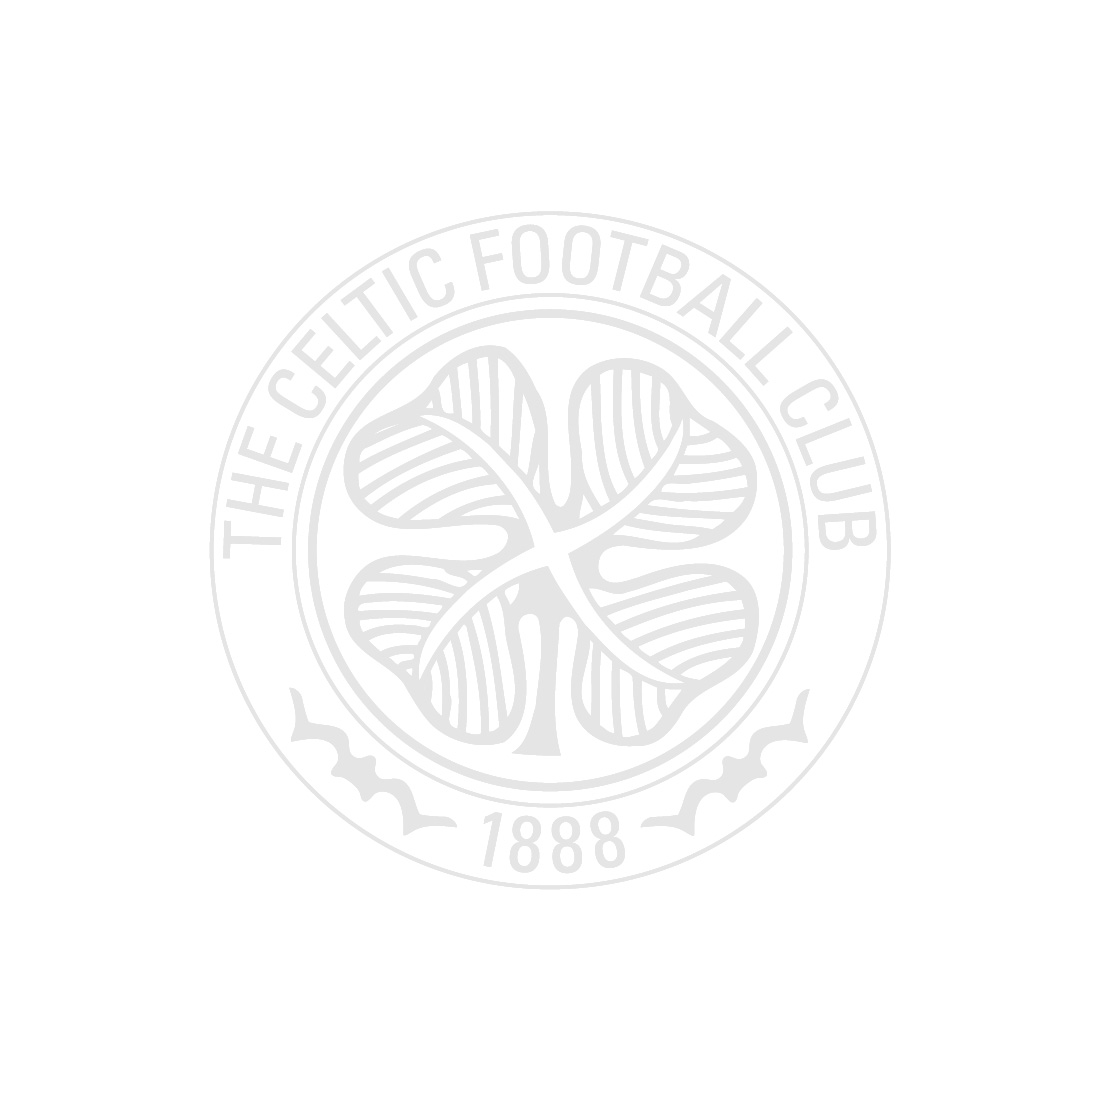 Celtic FC Jelly Babies